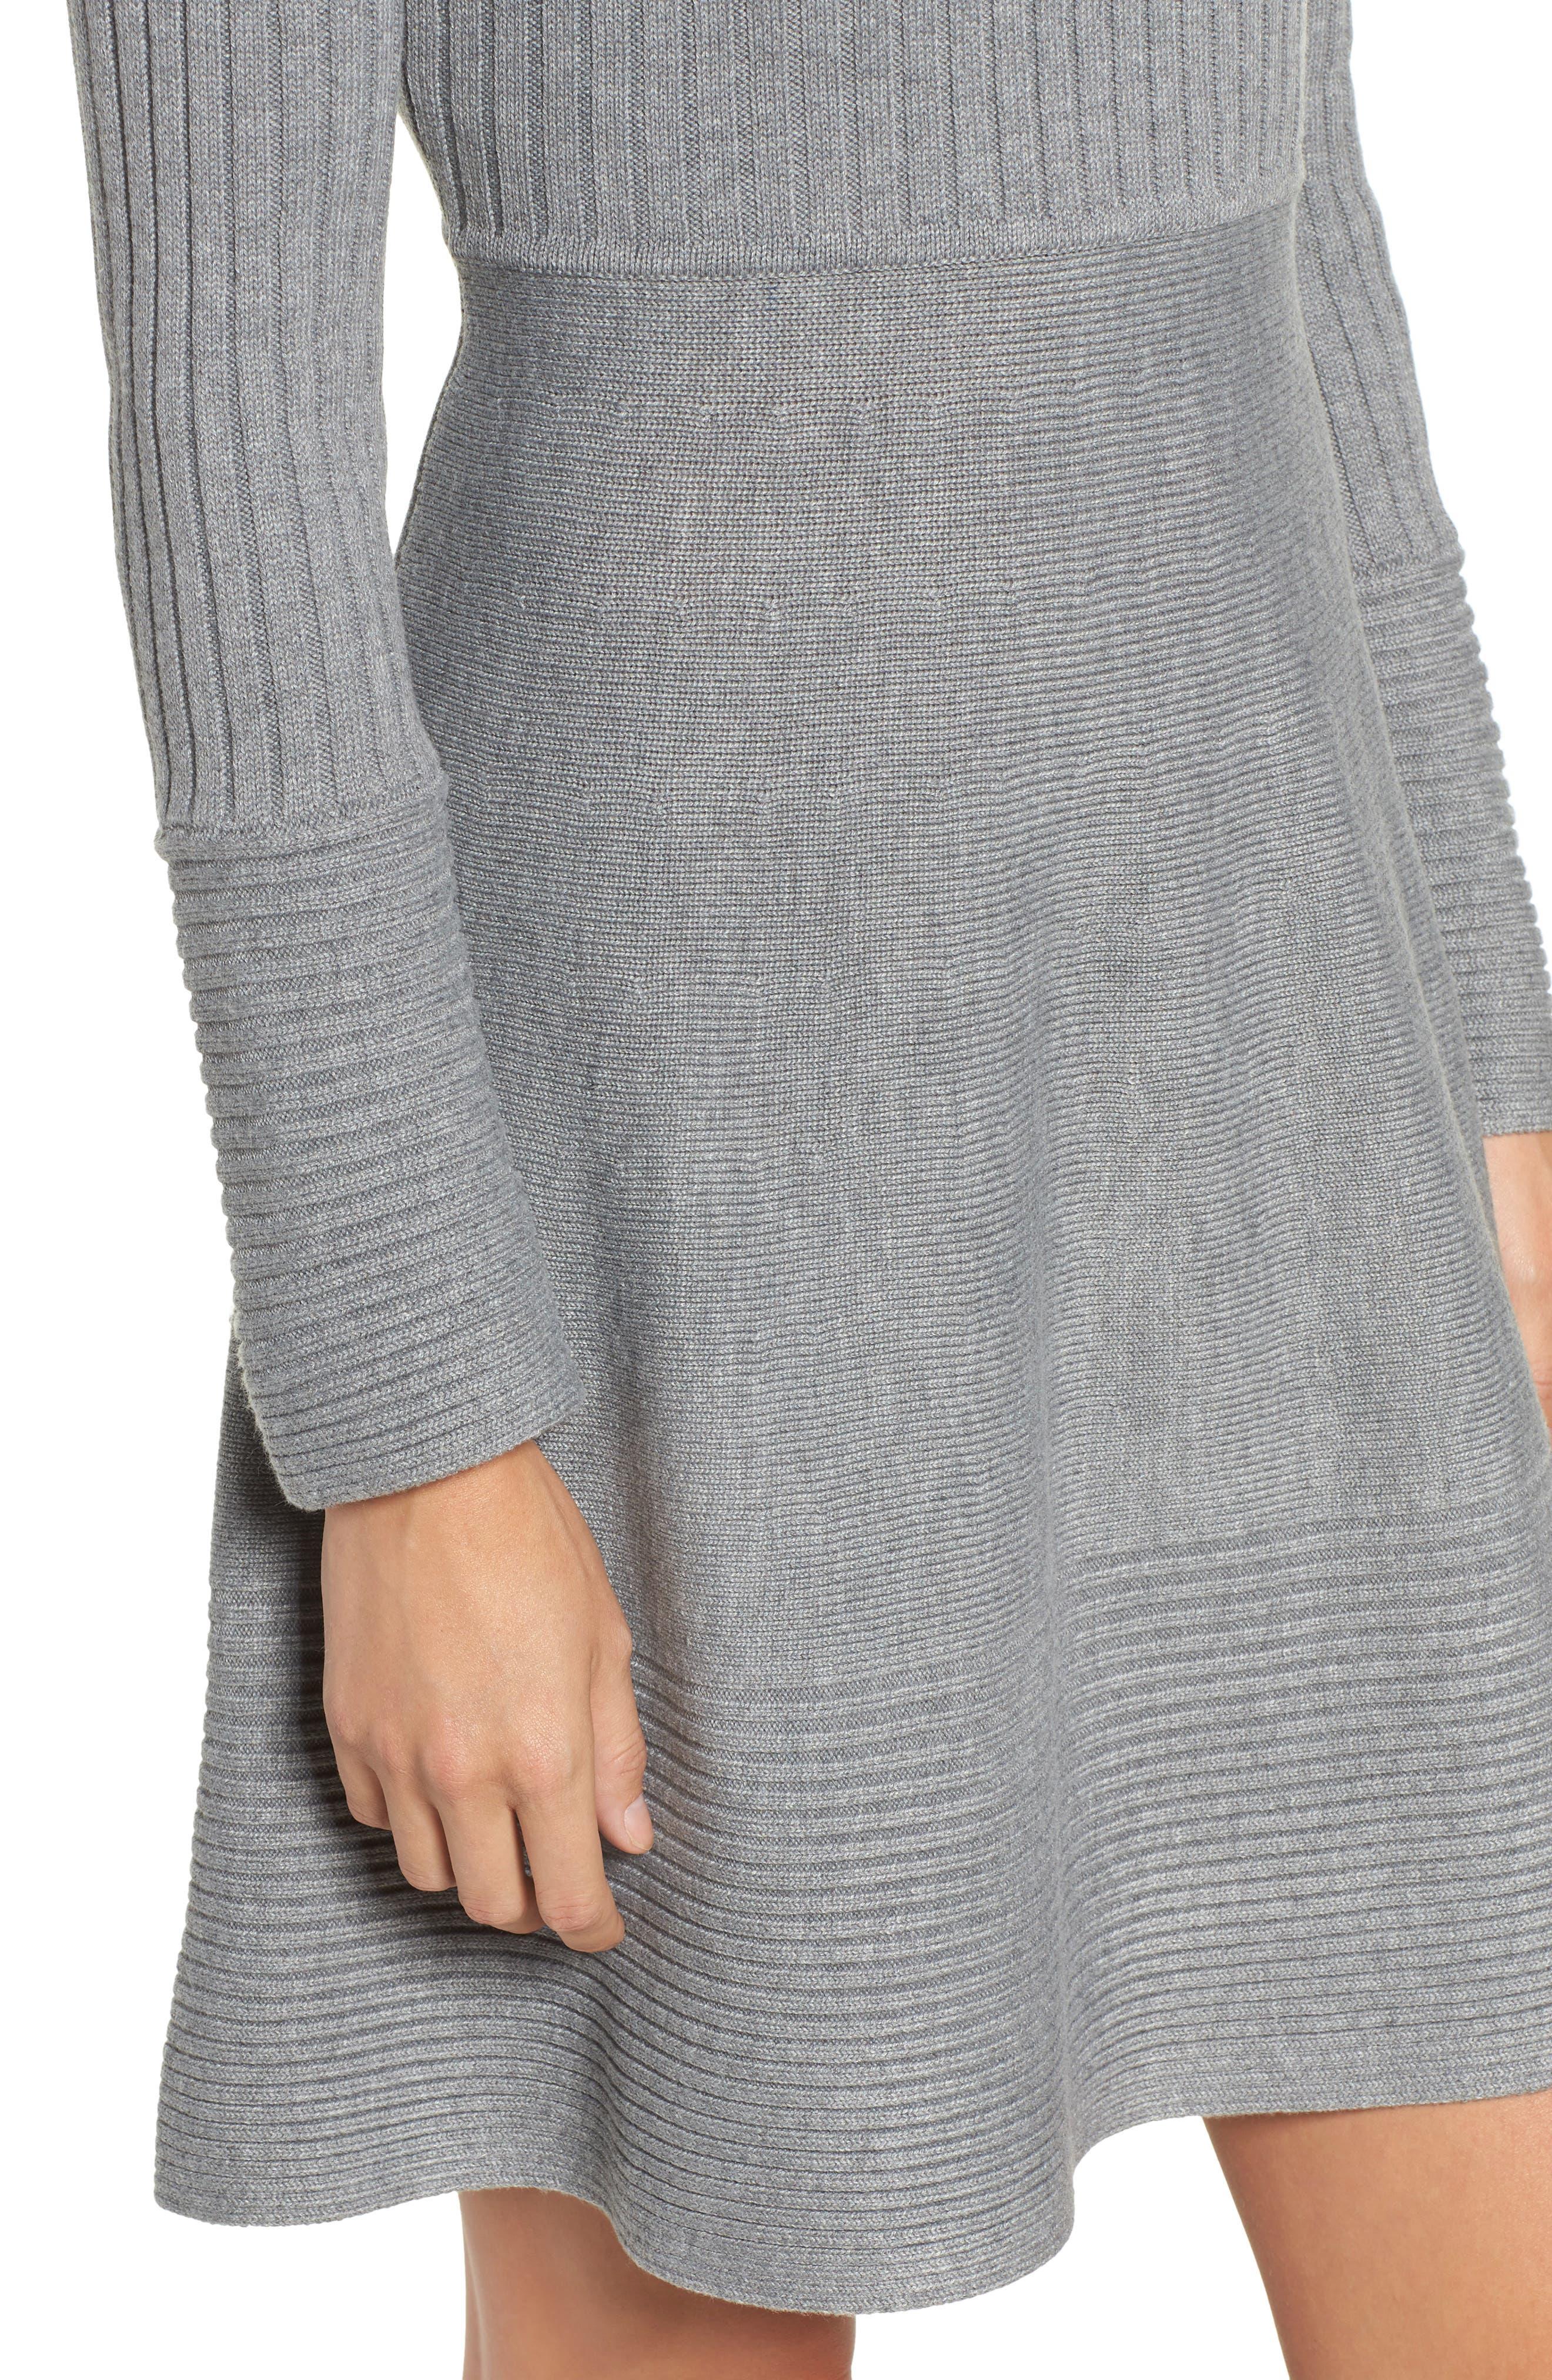 Turtleneck Sweater Dress,                             Alternate thumbnail 4, color,                             GREY